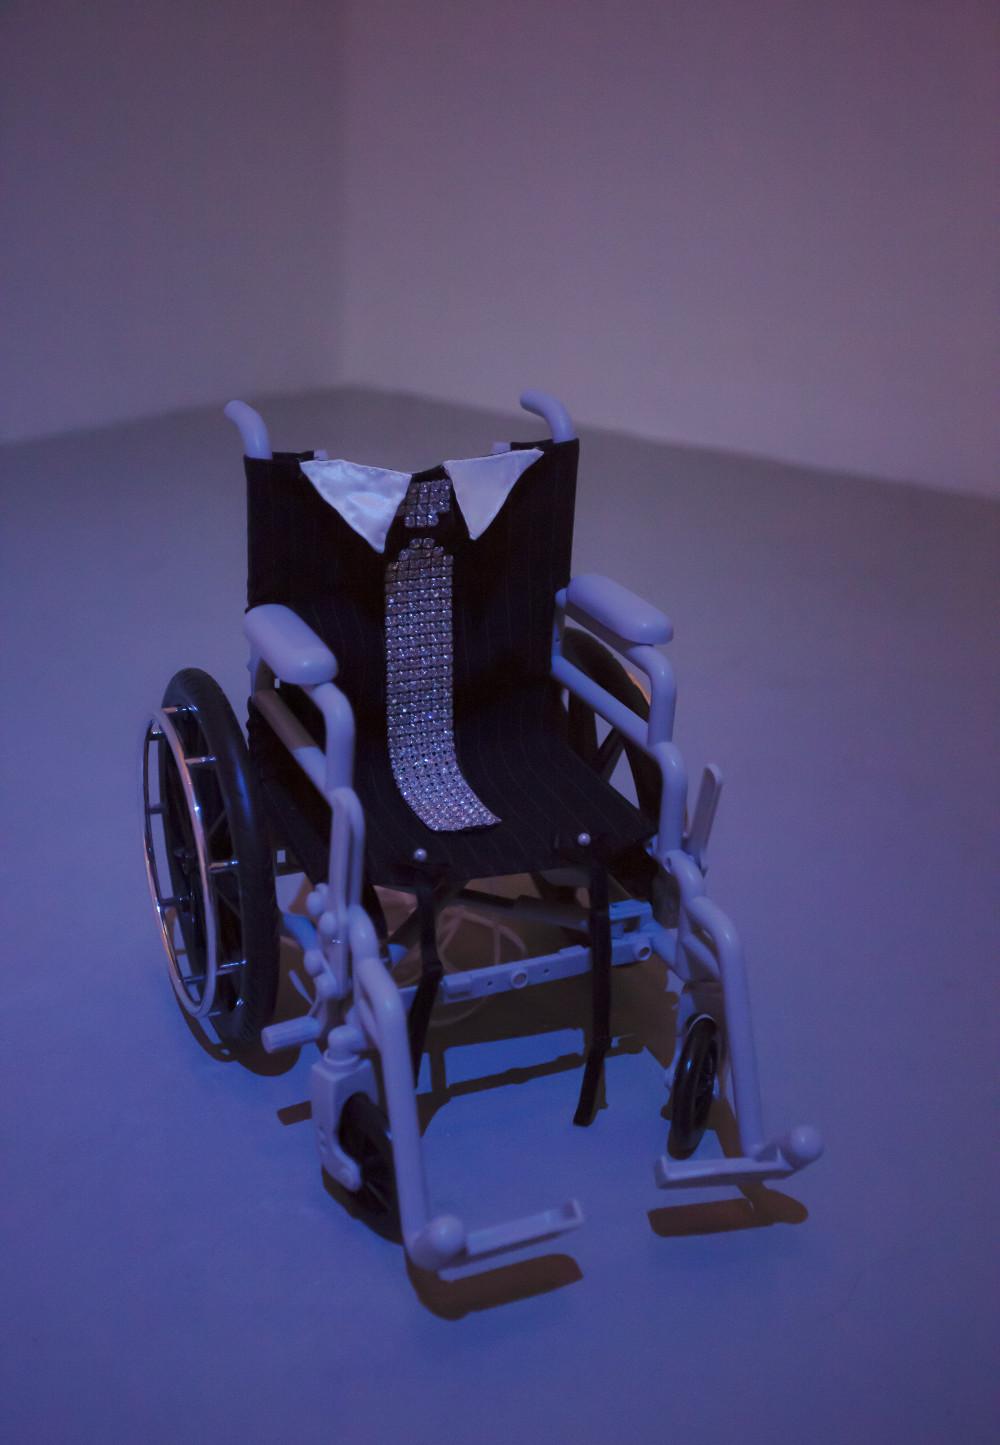 Flannery Silva American Girl Bodice, 2015 American Girl Doll wheelchair, pinstripe fabric, lace grommet trim, ribbon, rhinestones, bows, mini bra straps